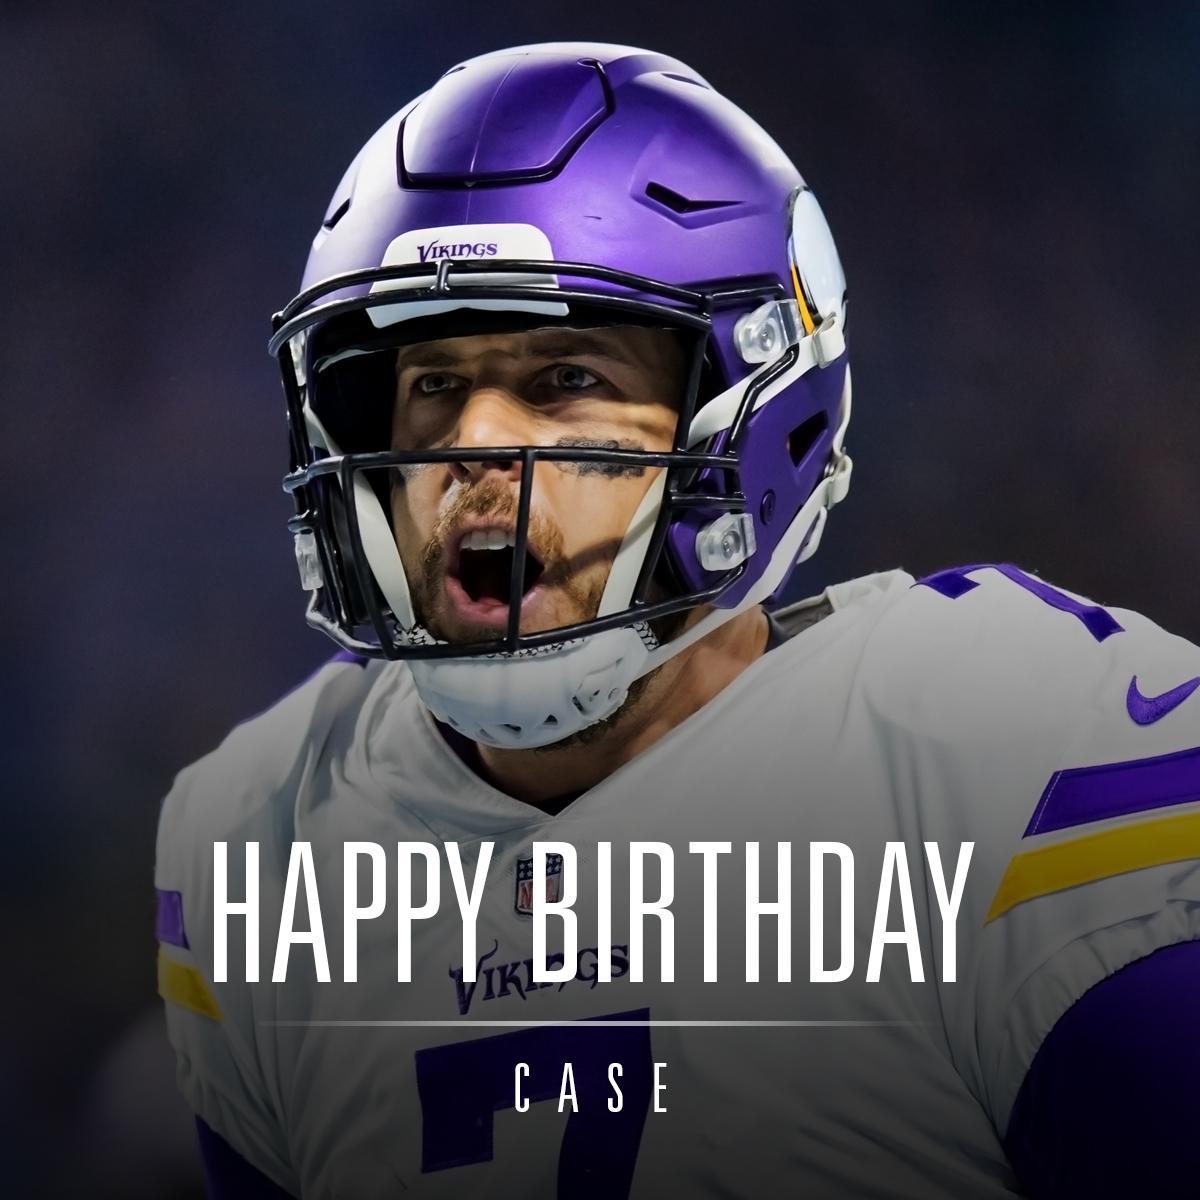 Happy birthday, @casekeenum7! https://t.co/zs2HnmOMRZ